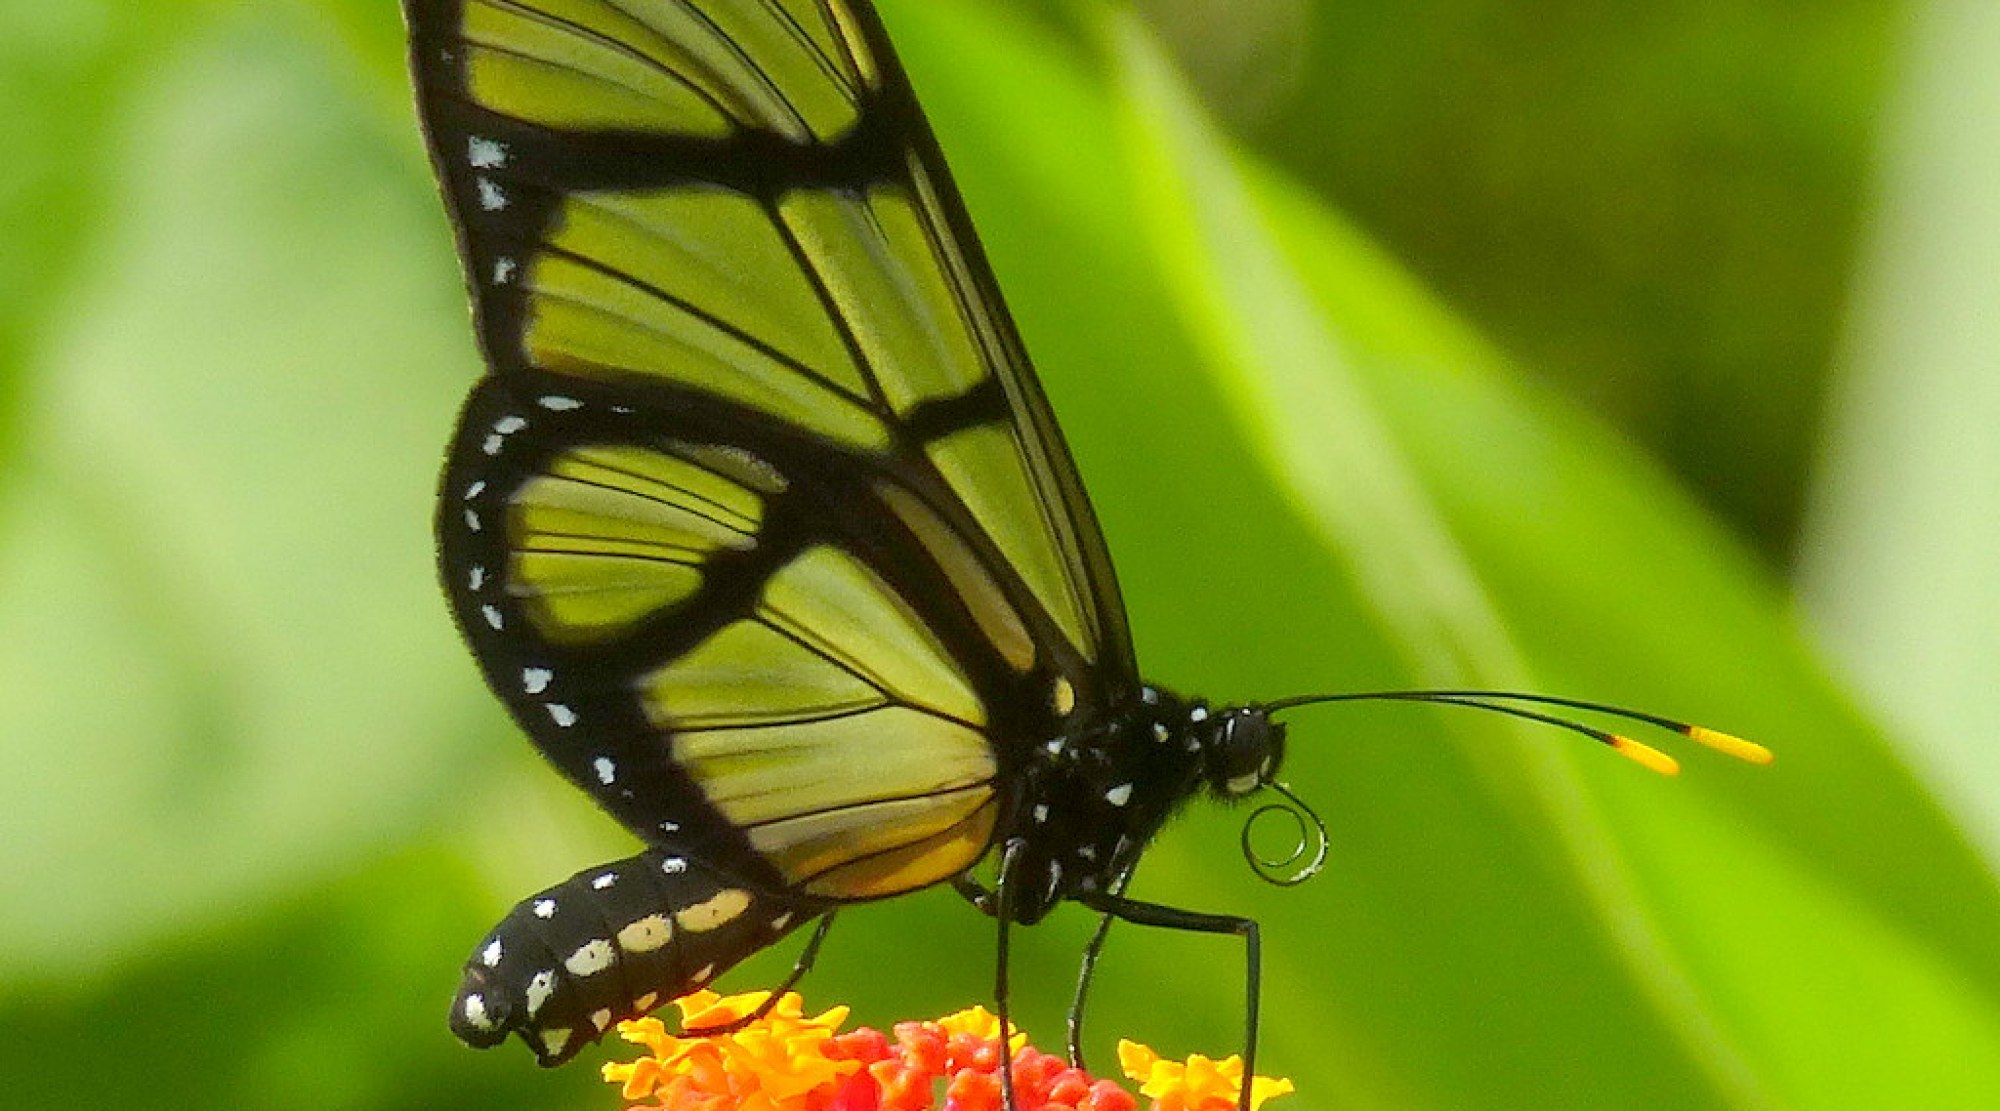 Glasswing butterfly, Methona sp. on Lantana camara